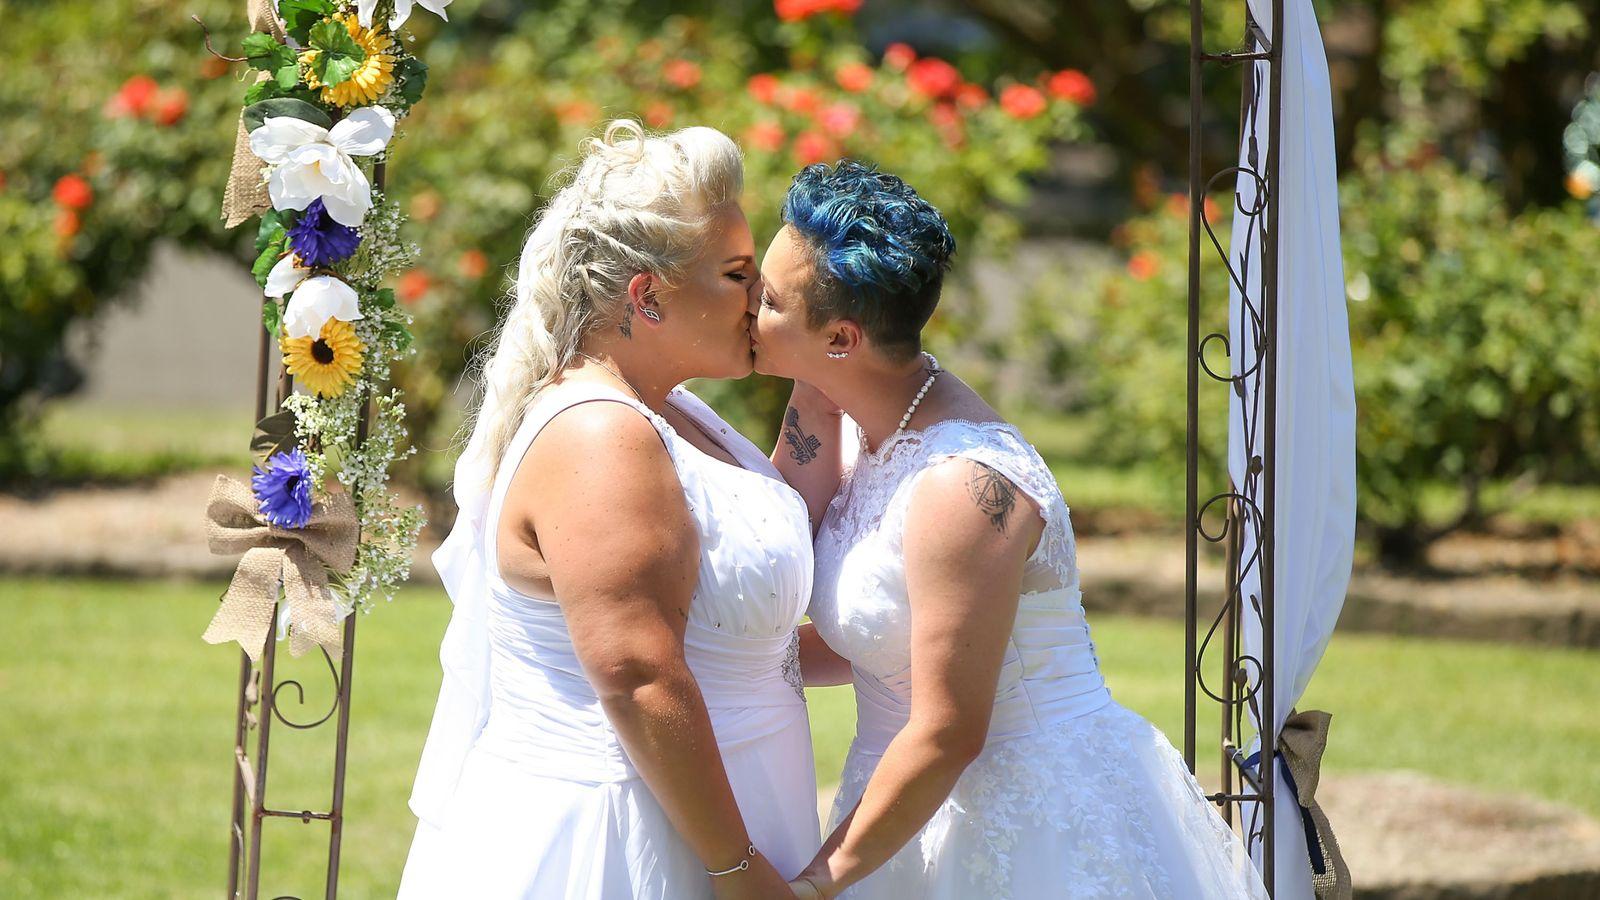 Online lesbian sex stories in Sydney